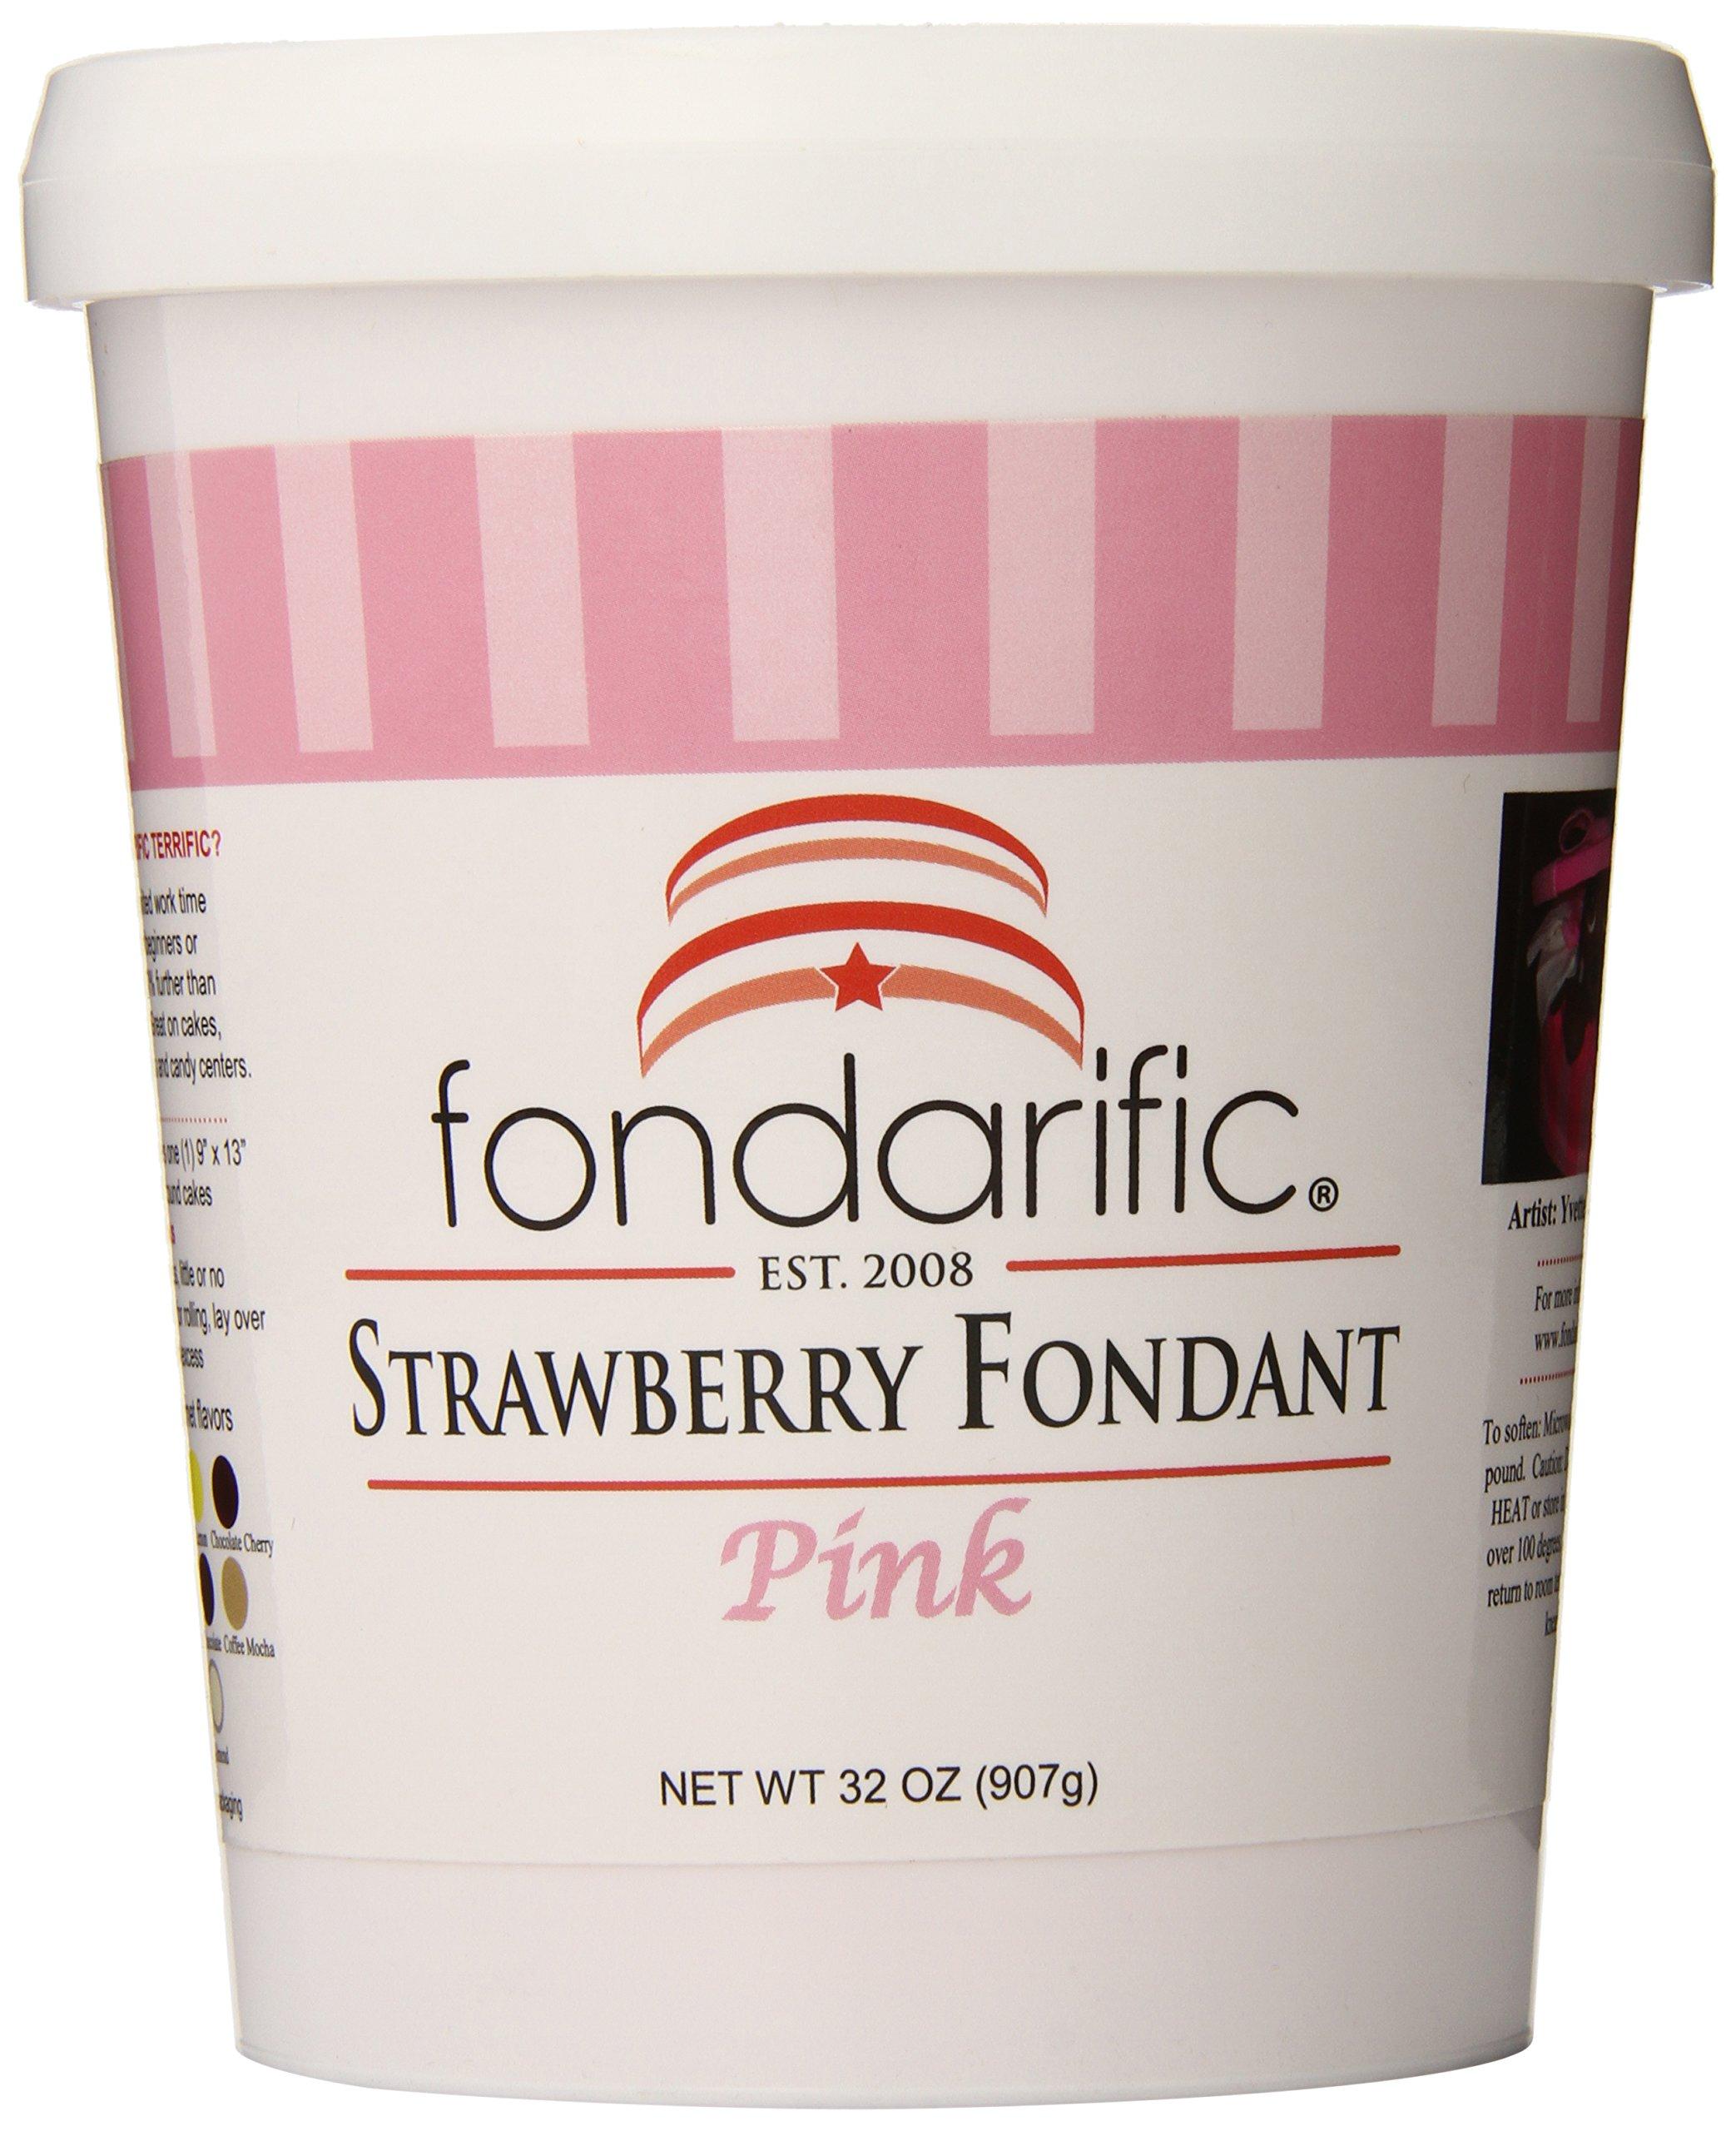 Fondarific Strawberry Fondant, 2-Pounds